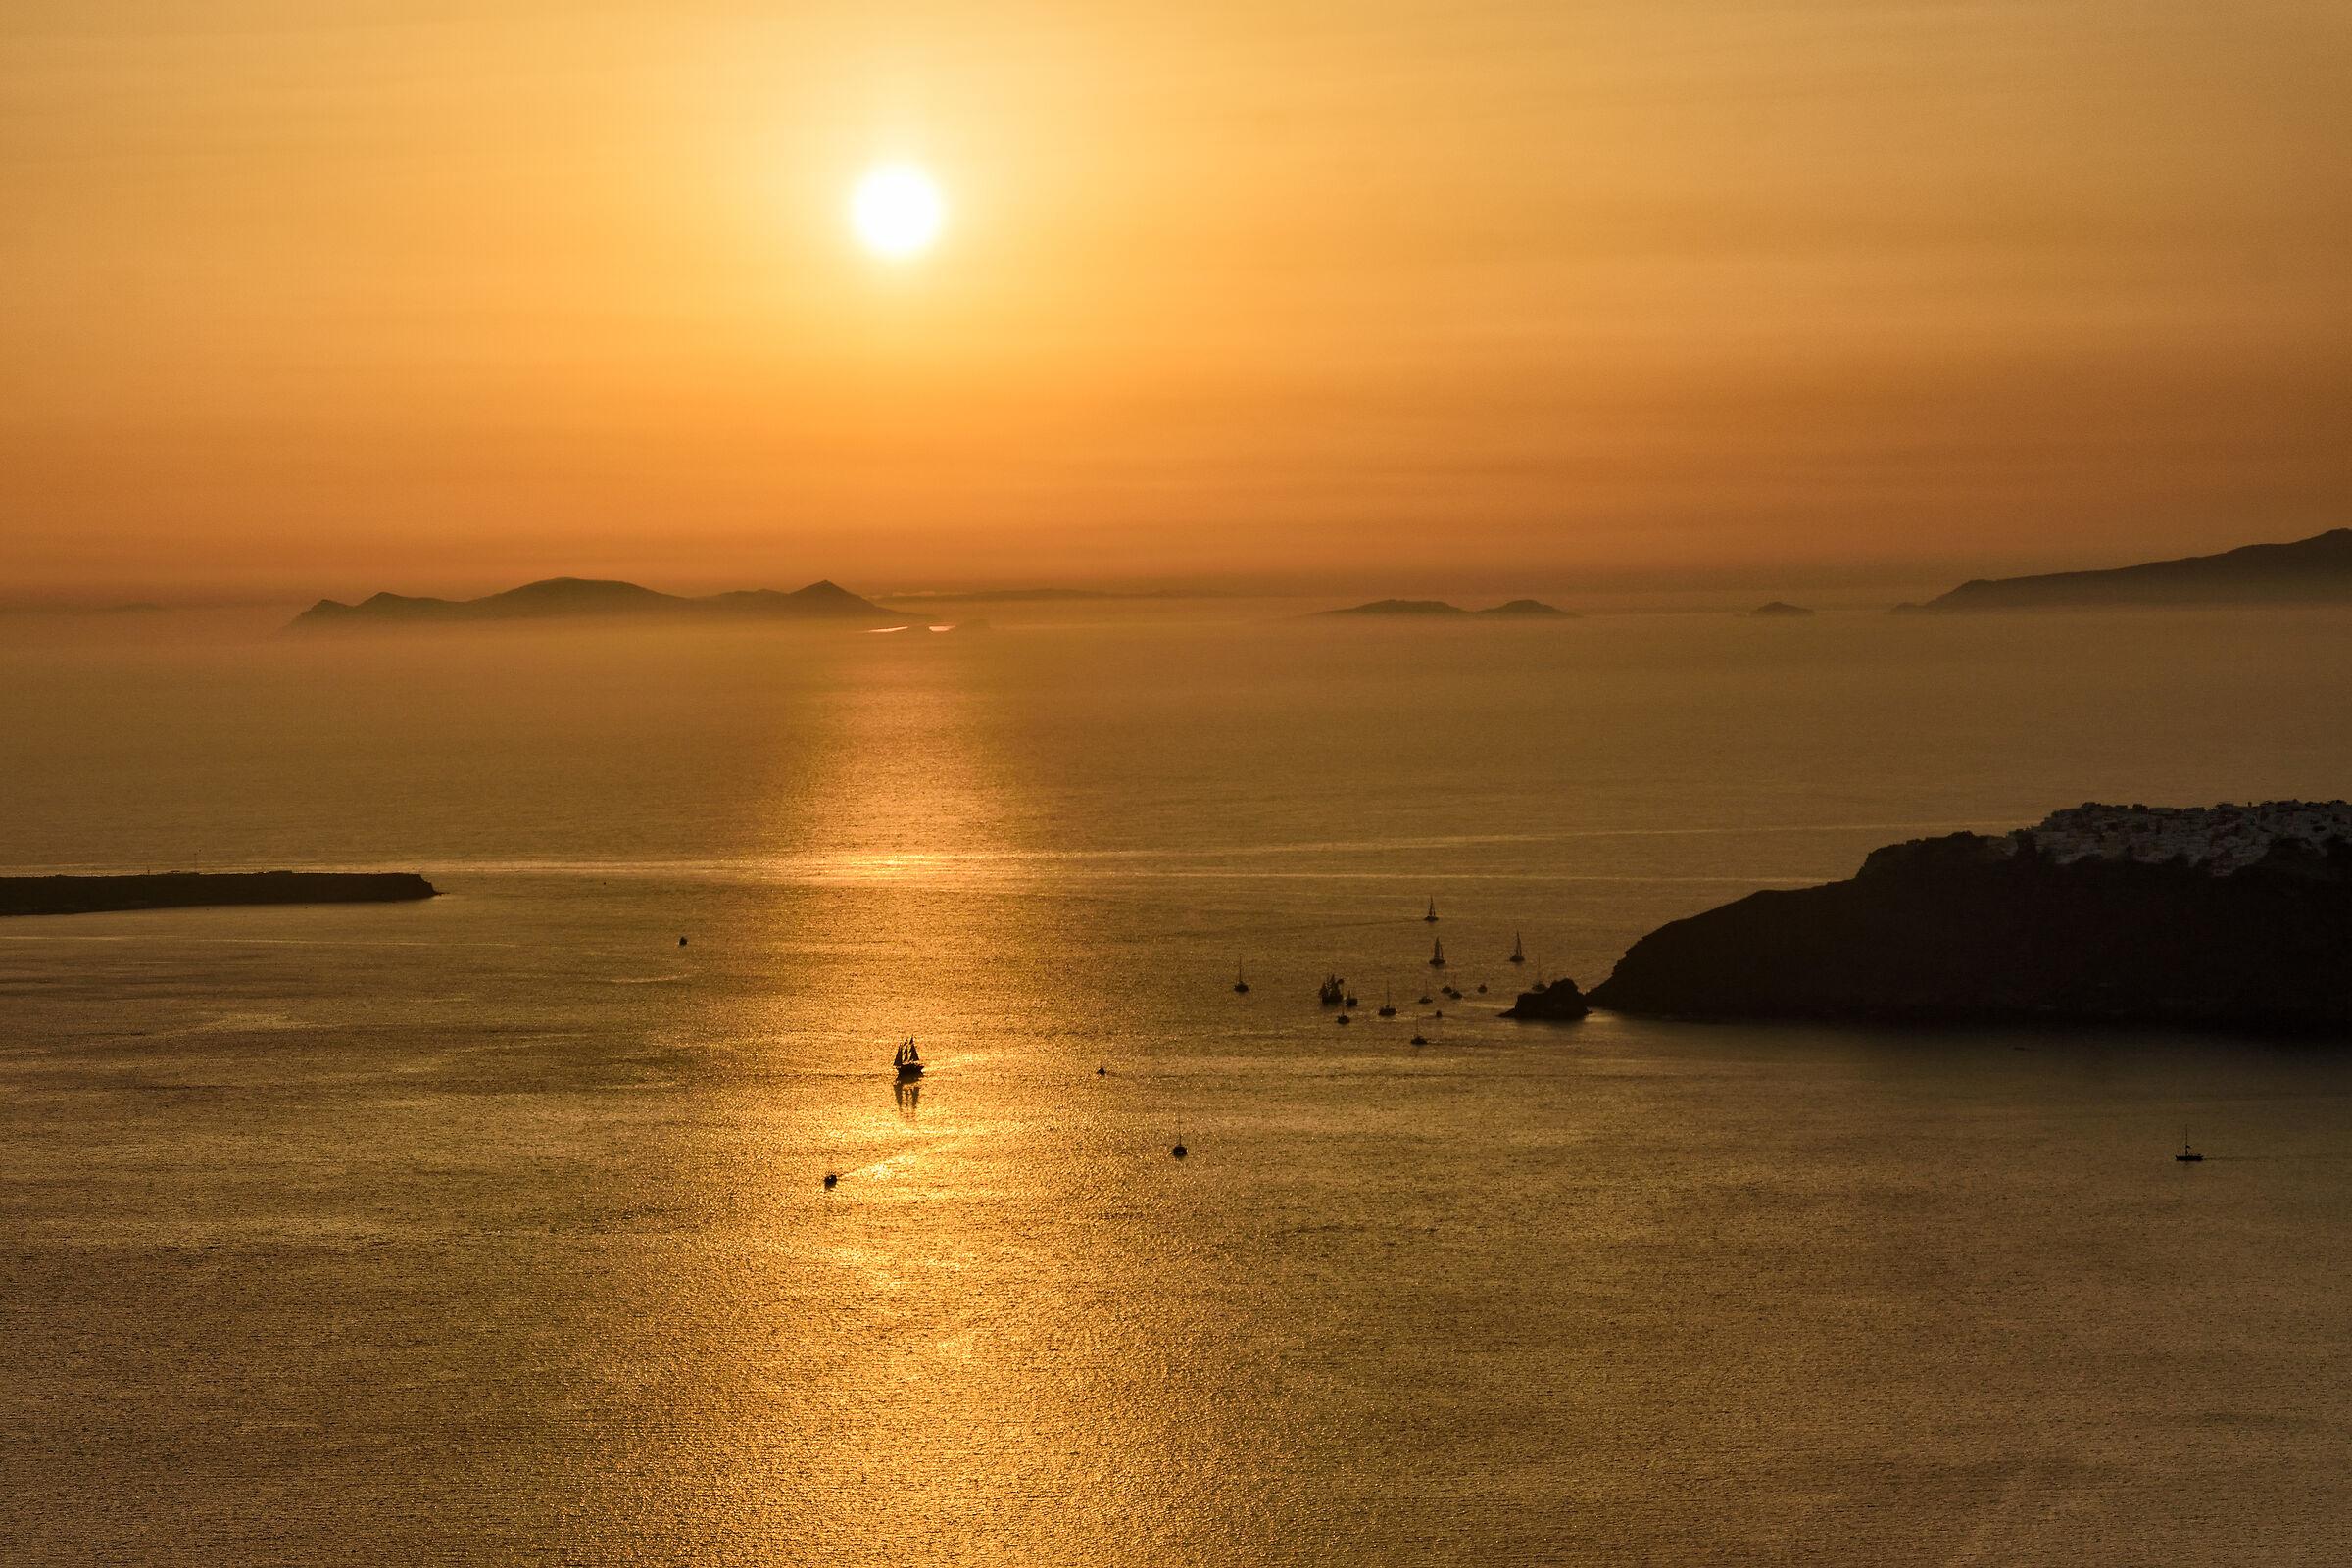 On the golden sea...